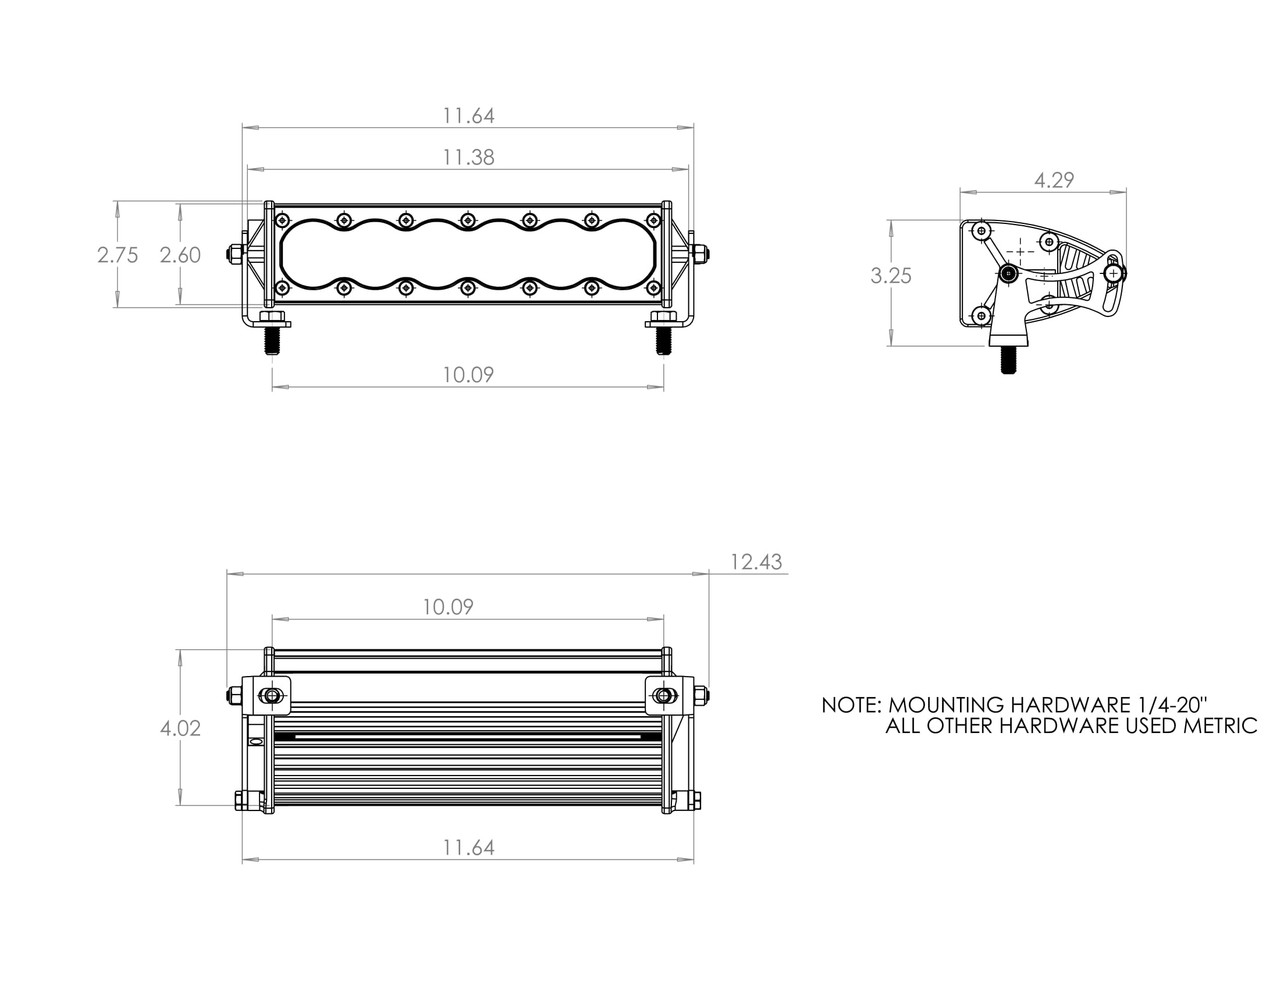 OnX6+, LED Light Bars